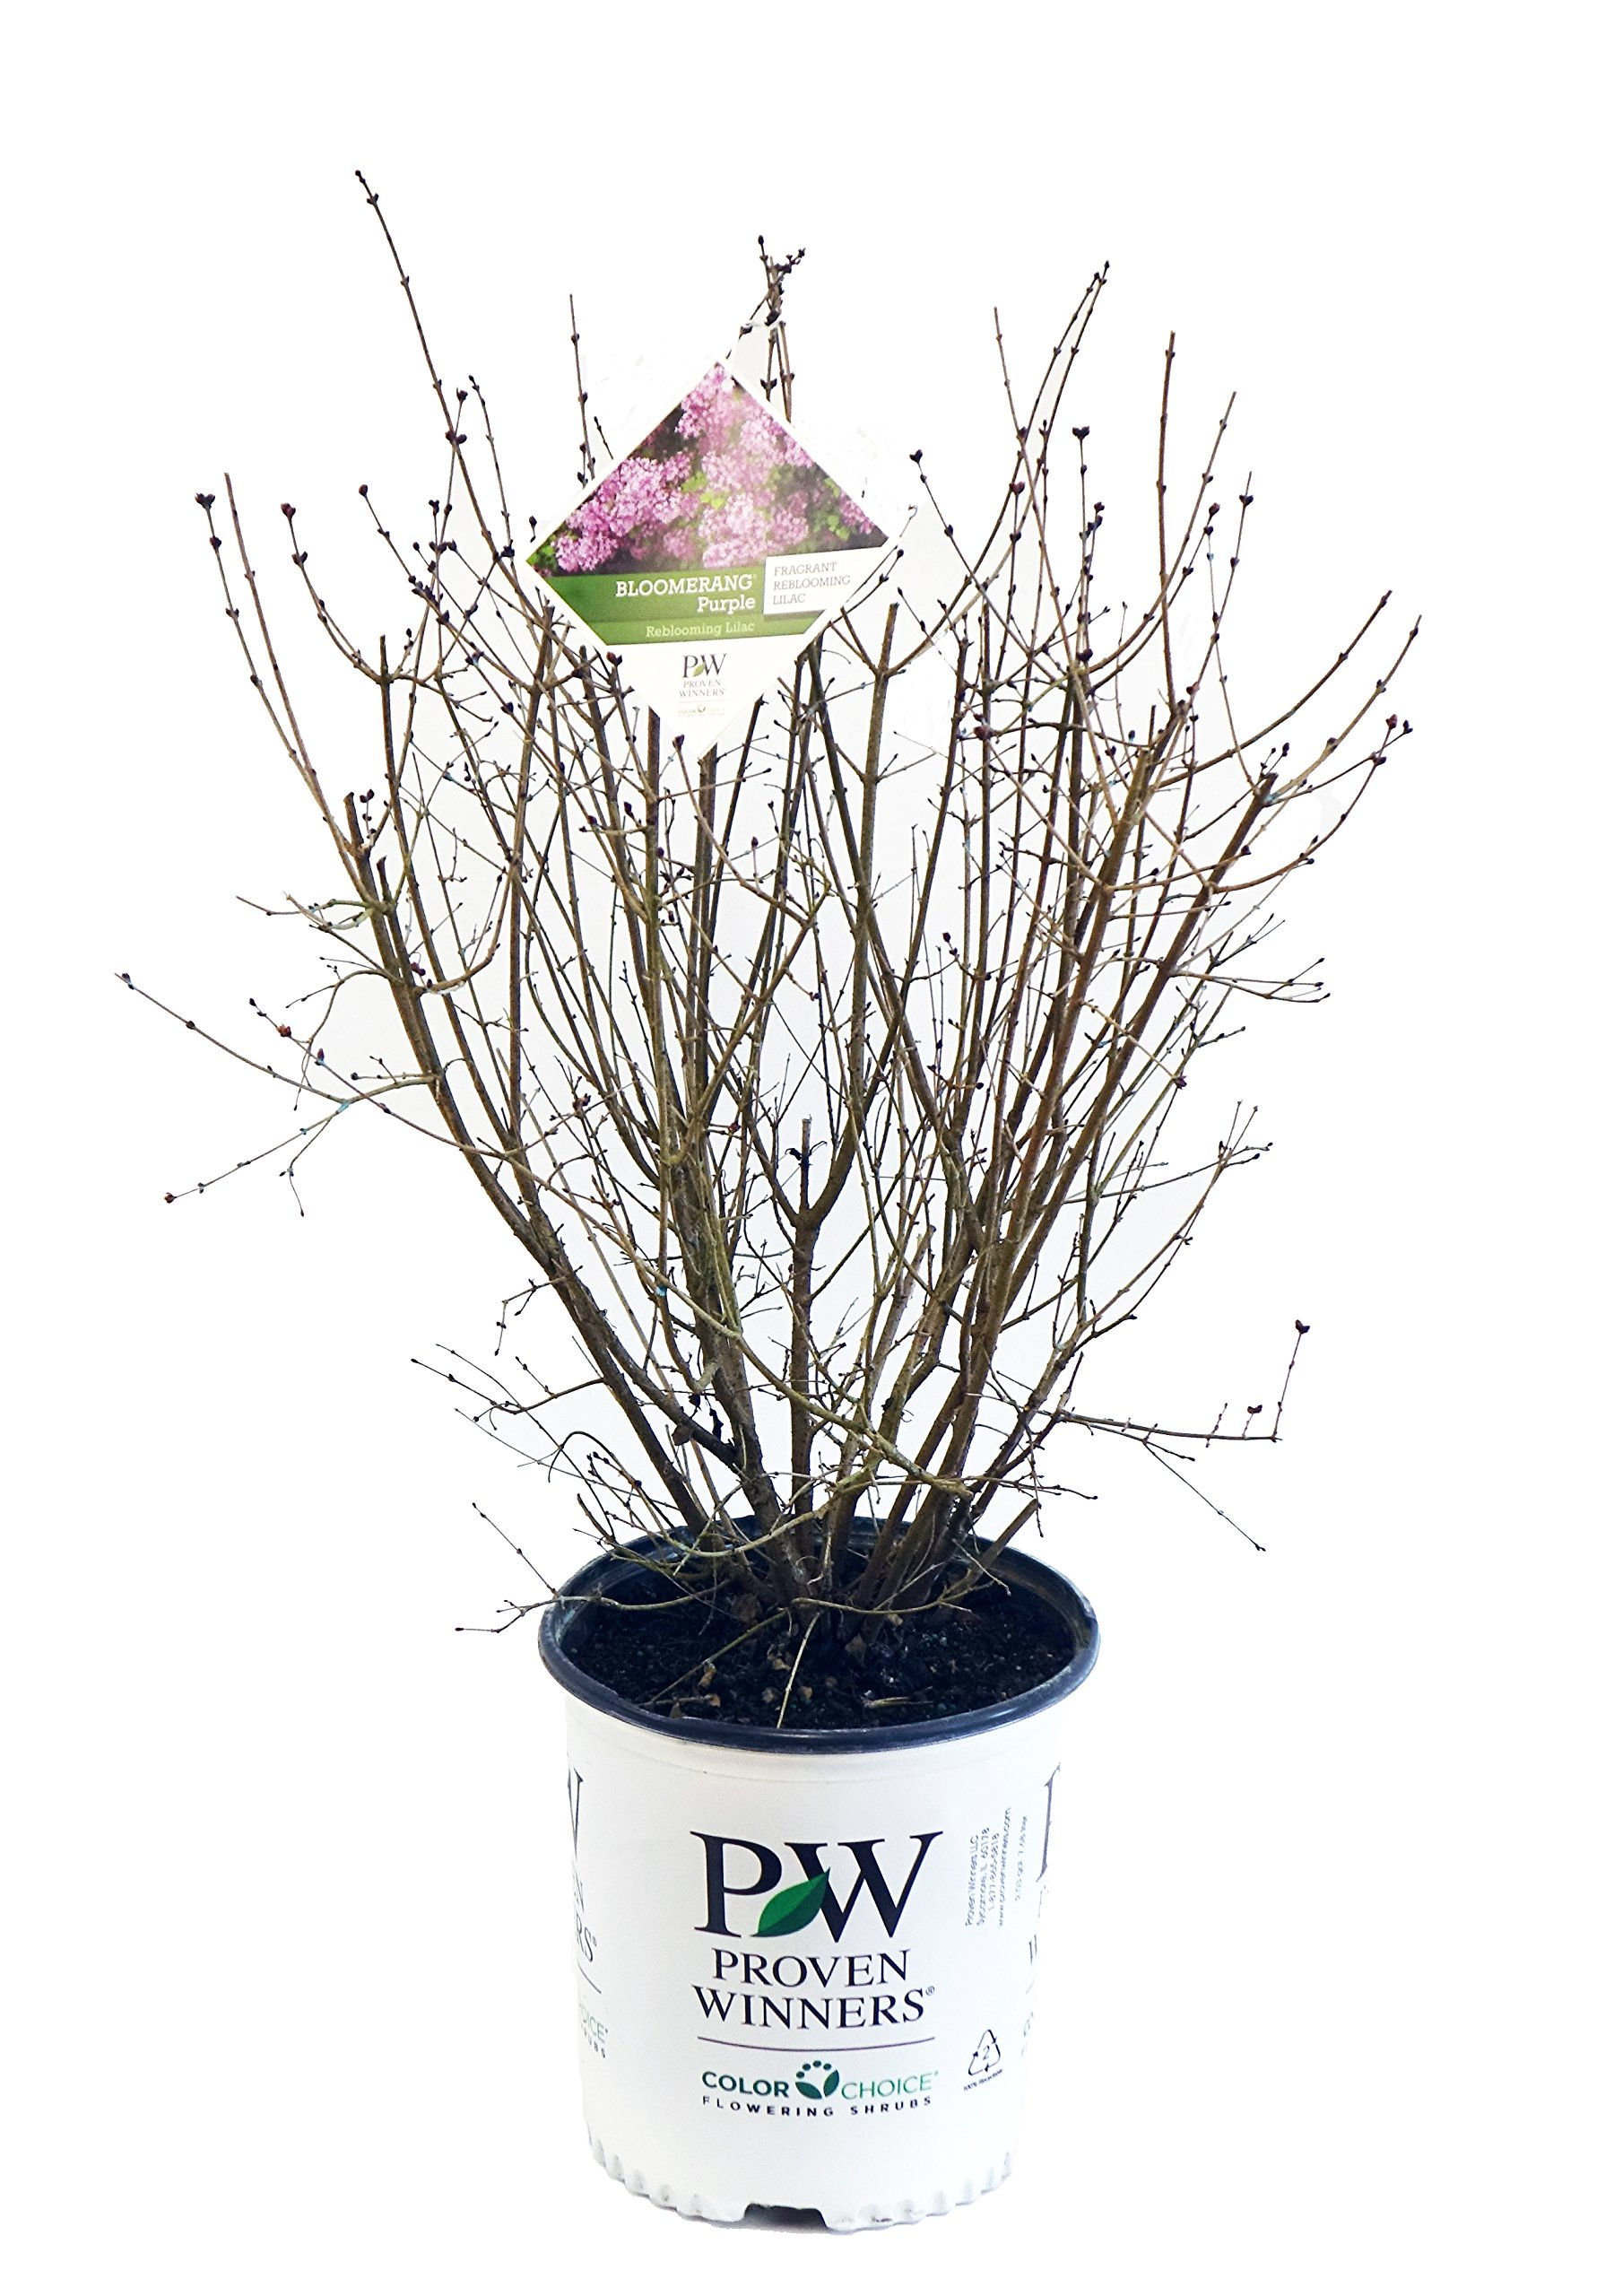 Proven Winners - Syringa x Bloomerang Purple (Reblooming Lilac) Shrub, purple flowers, #2 - Size Container